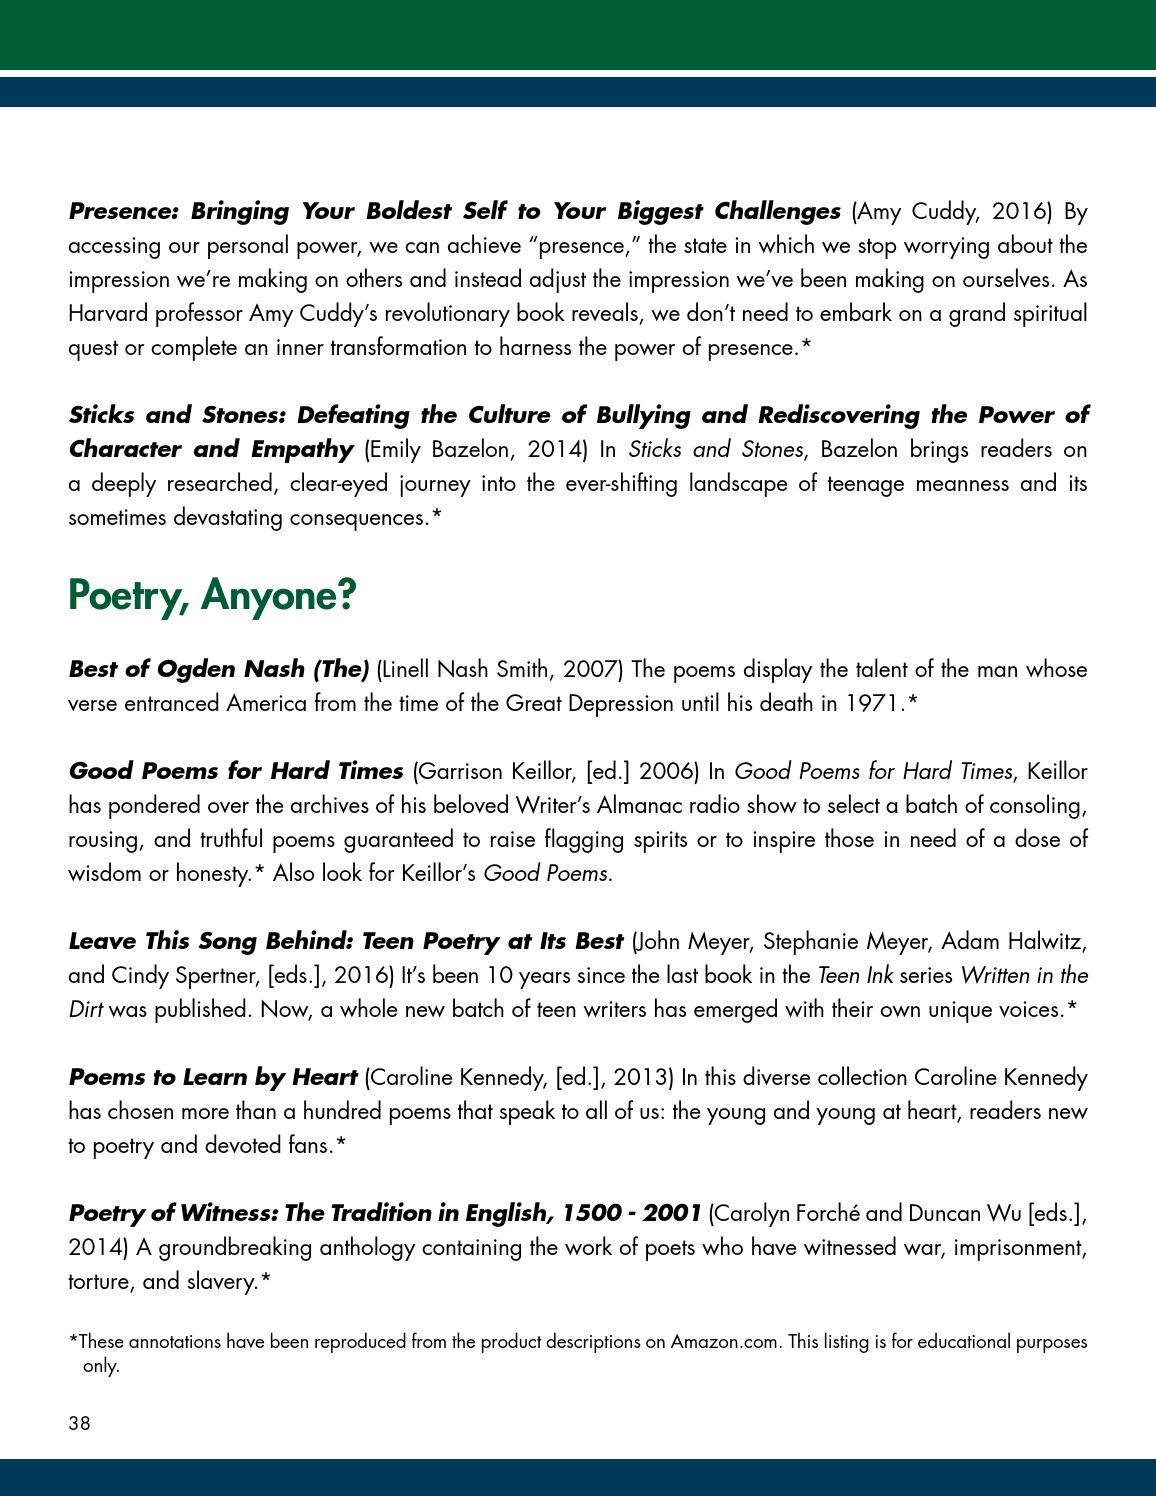 WRA Summer Reading Program 2016 by Western Reserve Academy - issuu